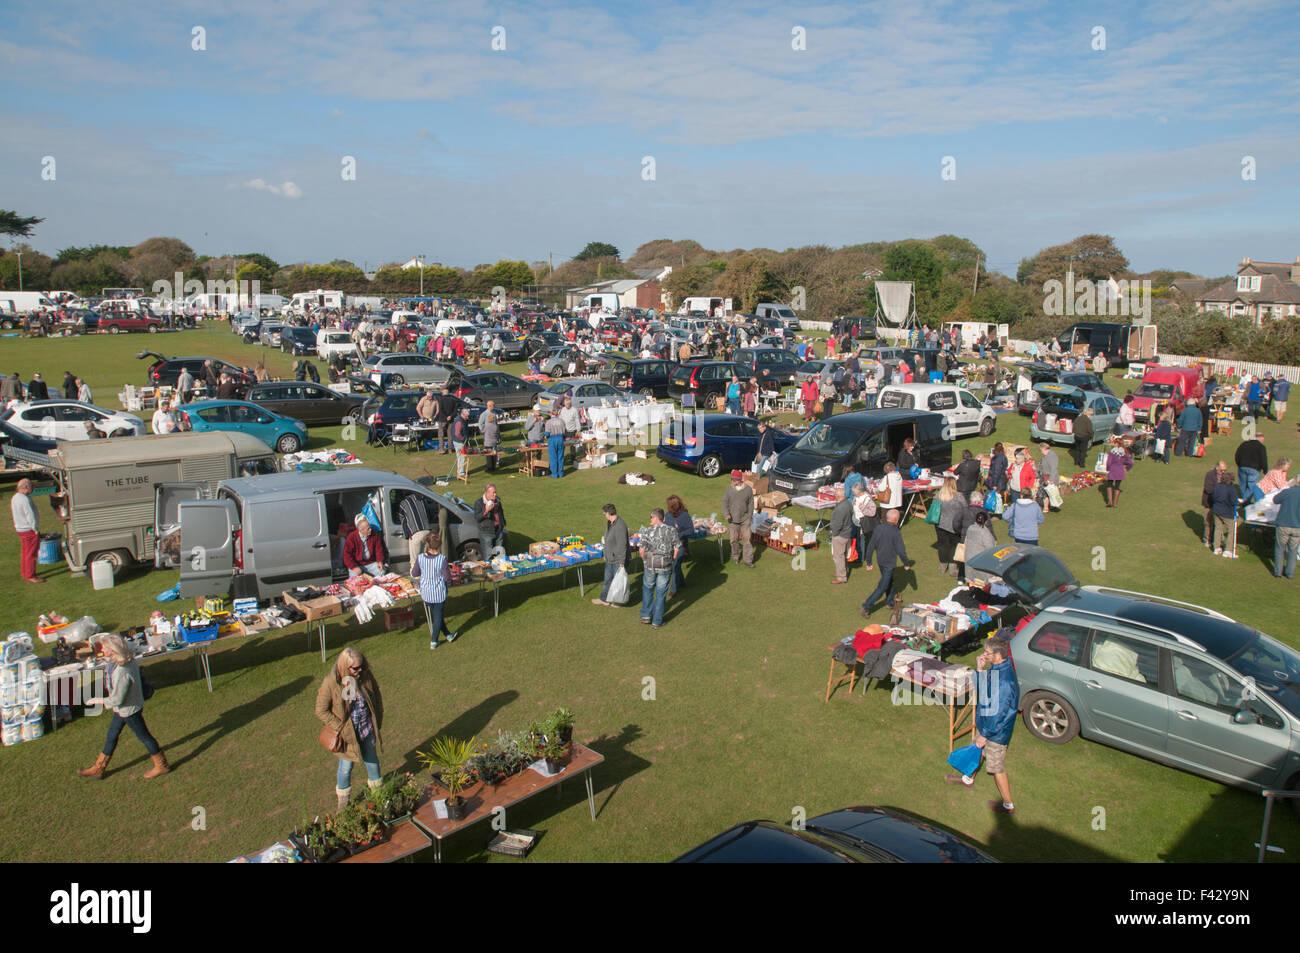 Rosudgeon car boot fair - Stock Image